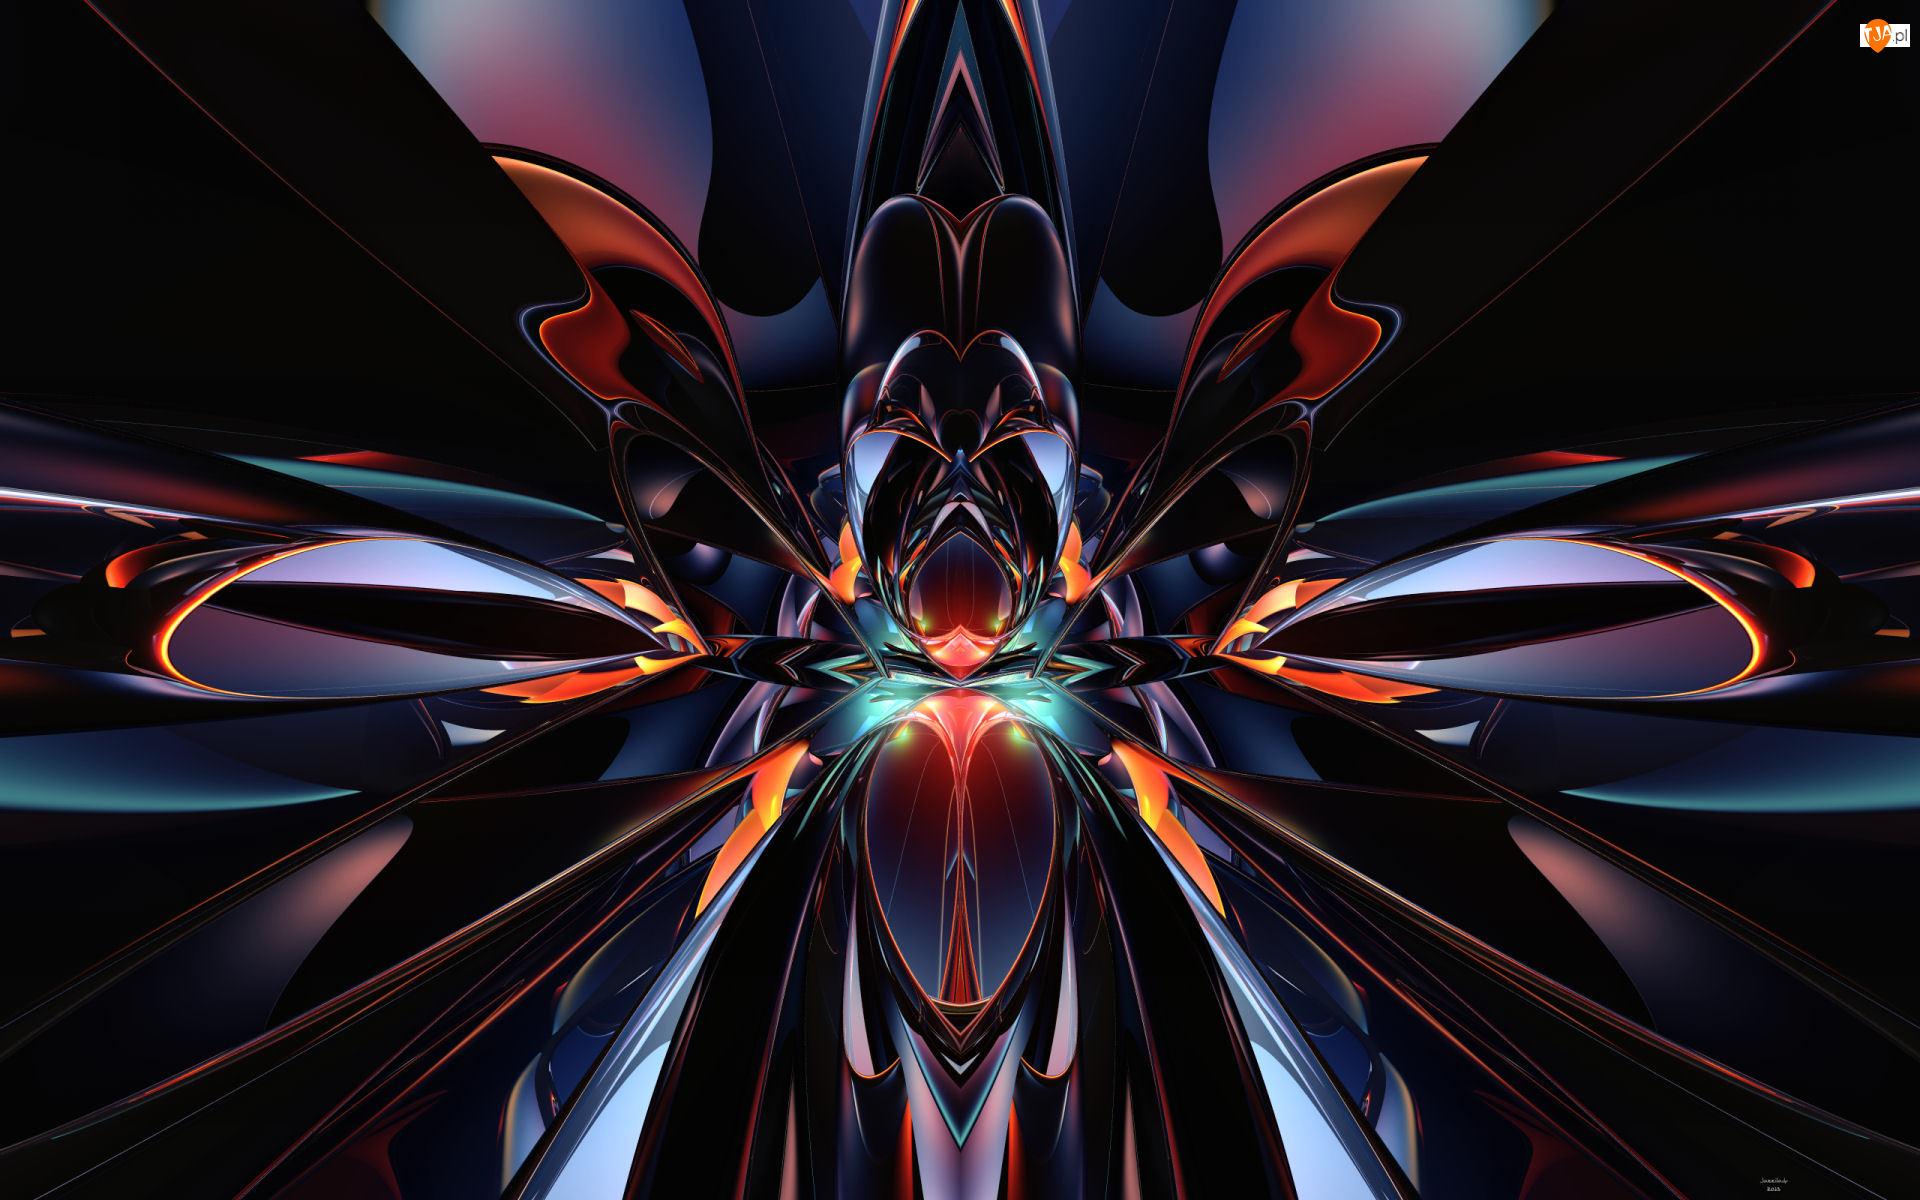 Abstrakcja, Grafika 3D